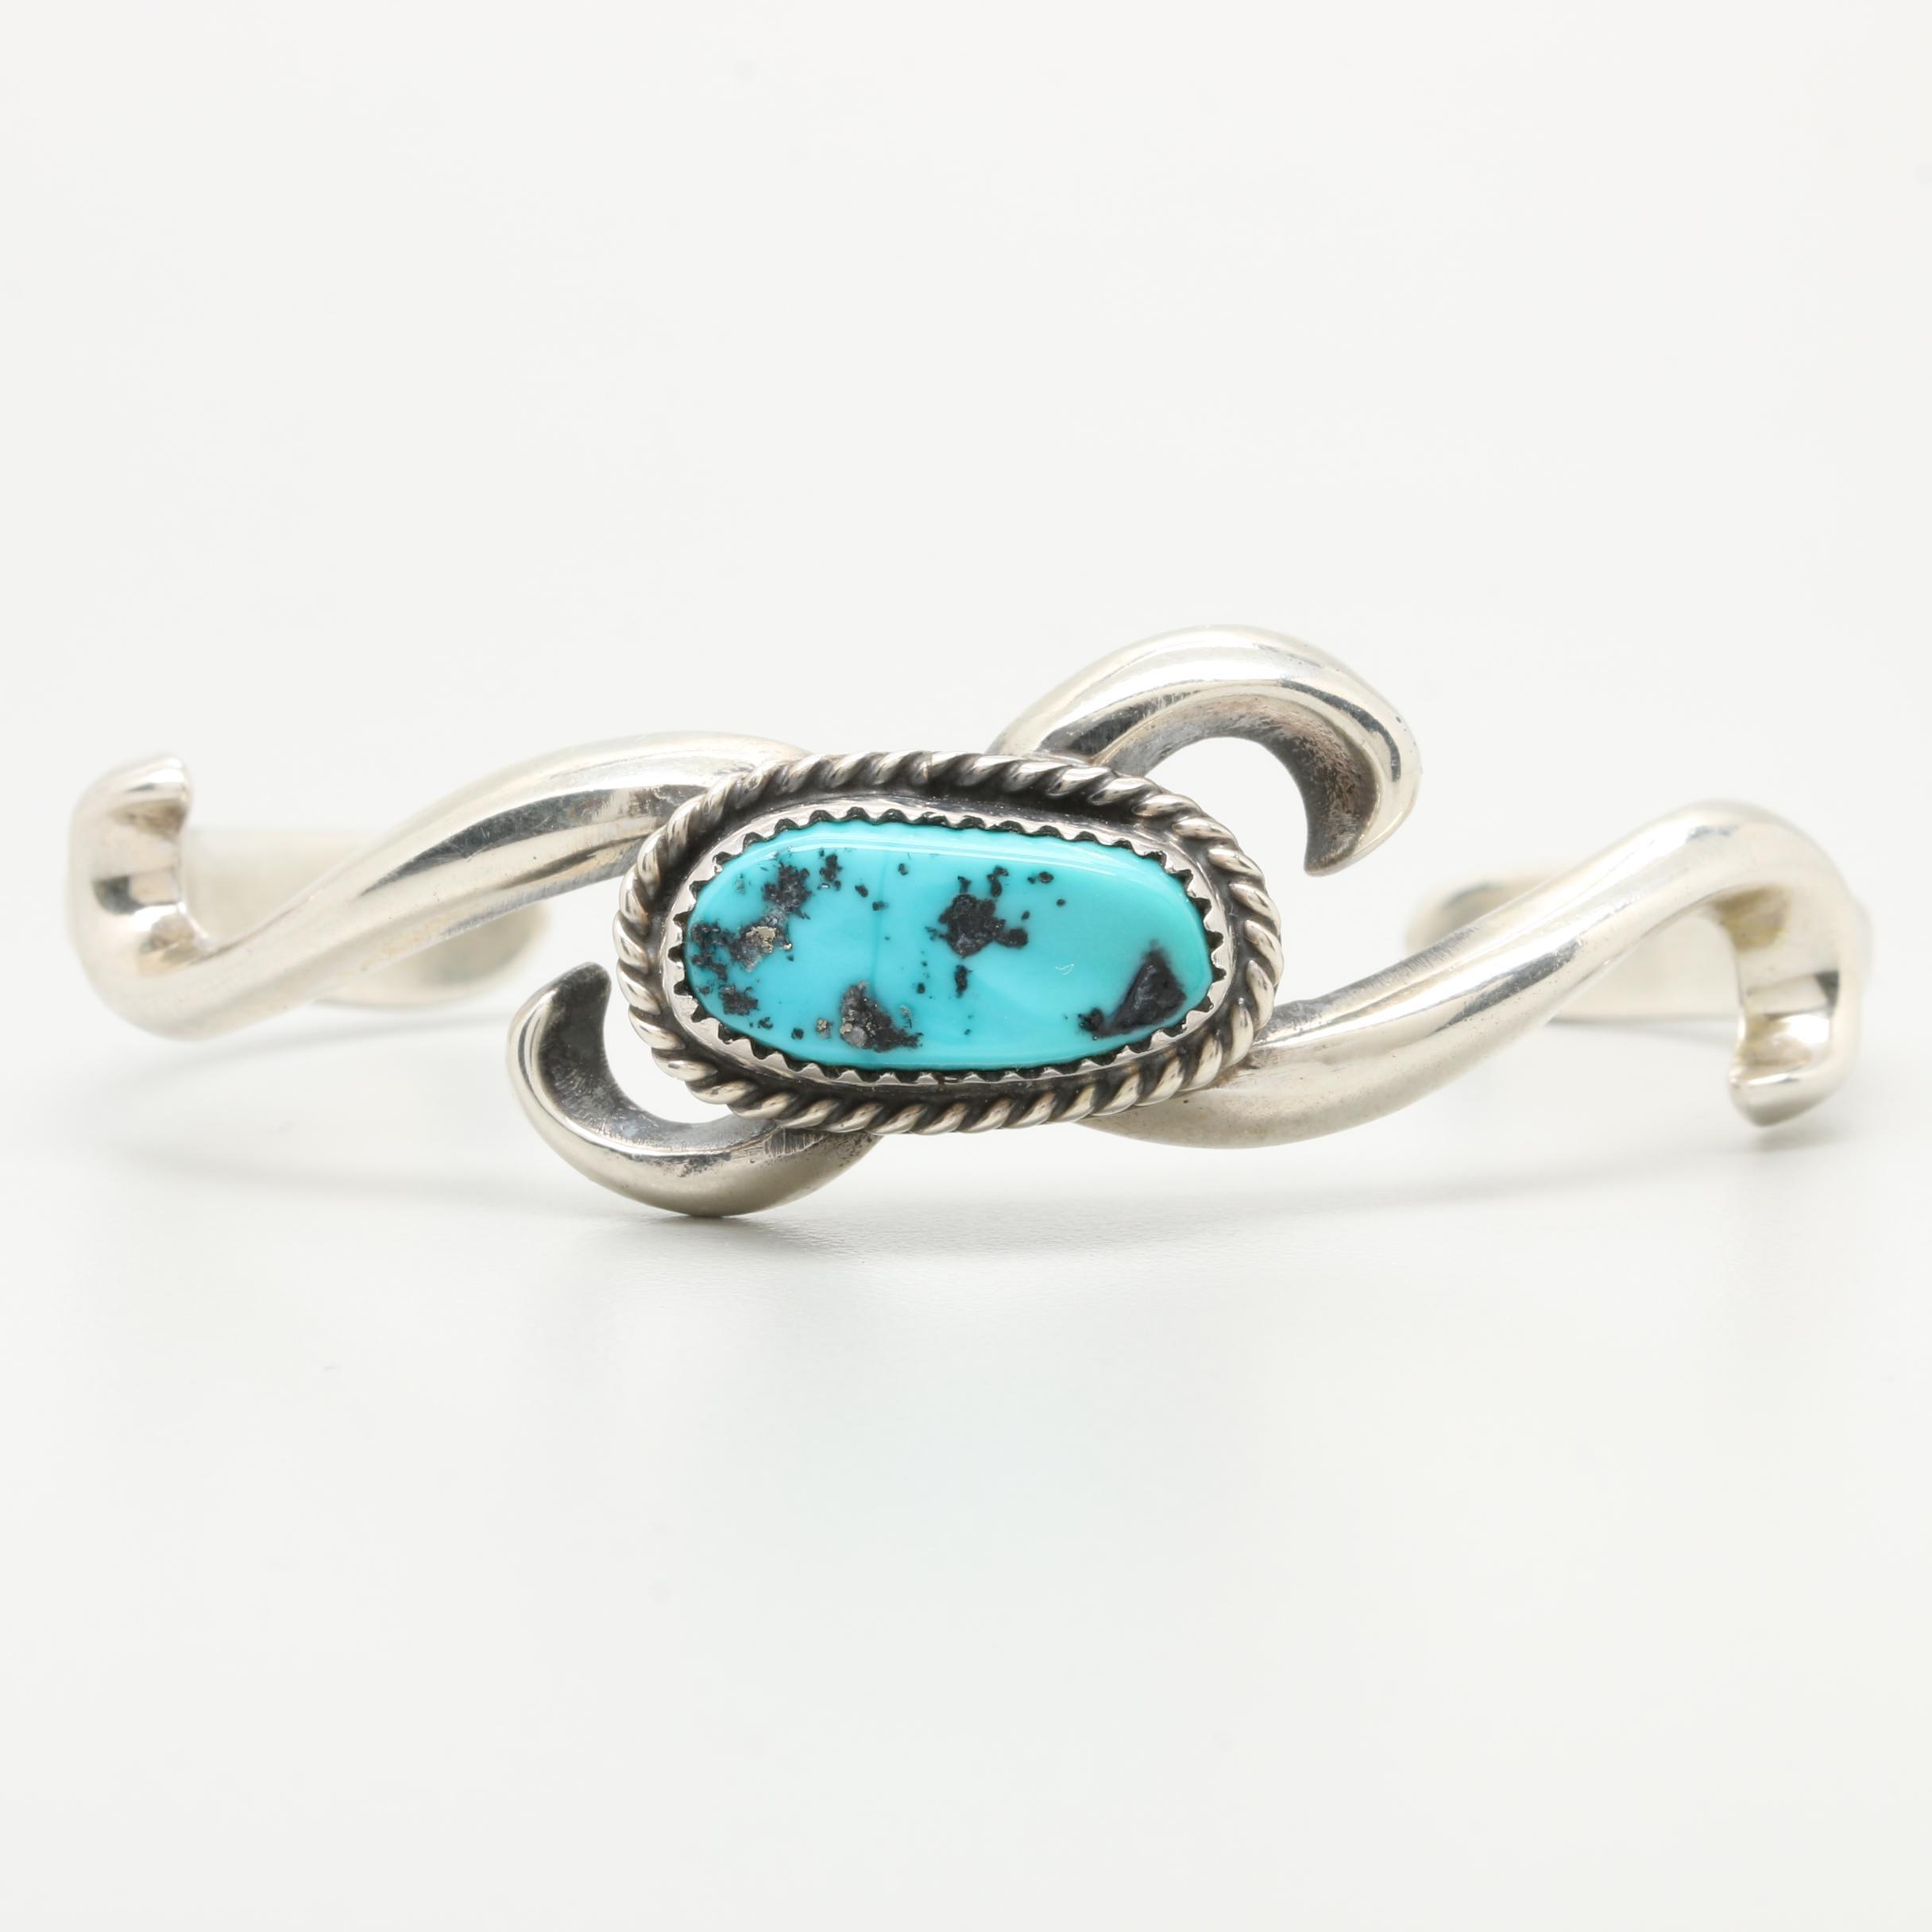 Francis L. Begay Navajo Diné Sterling Silver Turquoise Bracelet